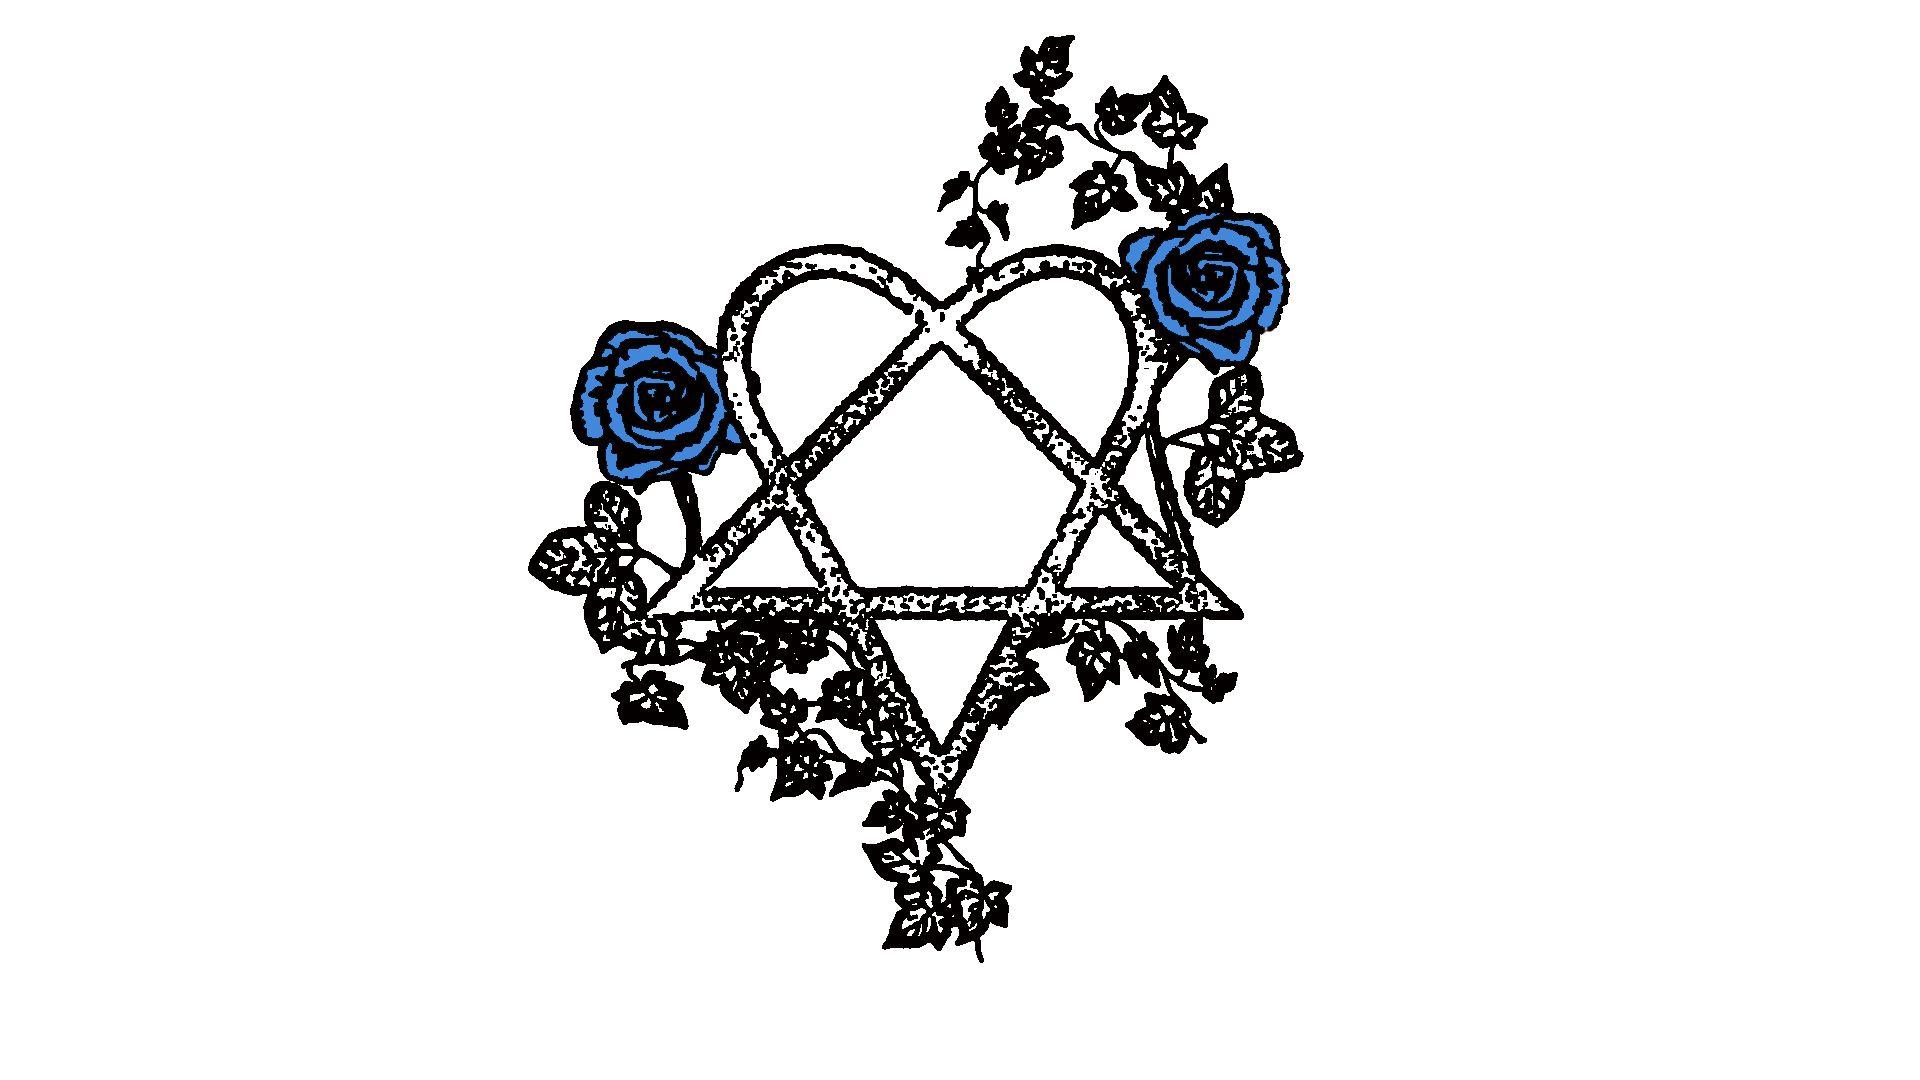 tattoo heartagram design by LilxMissxSpookiness on DeviantArt